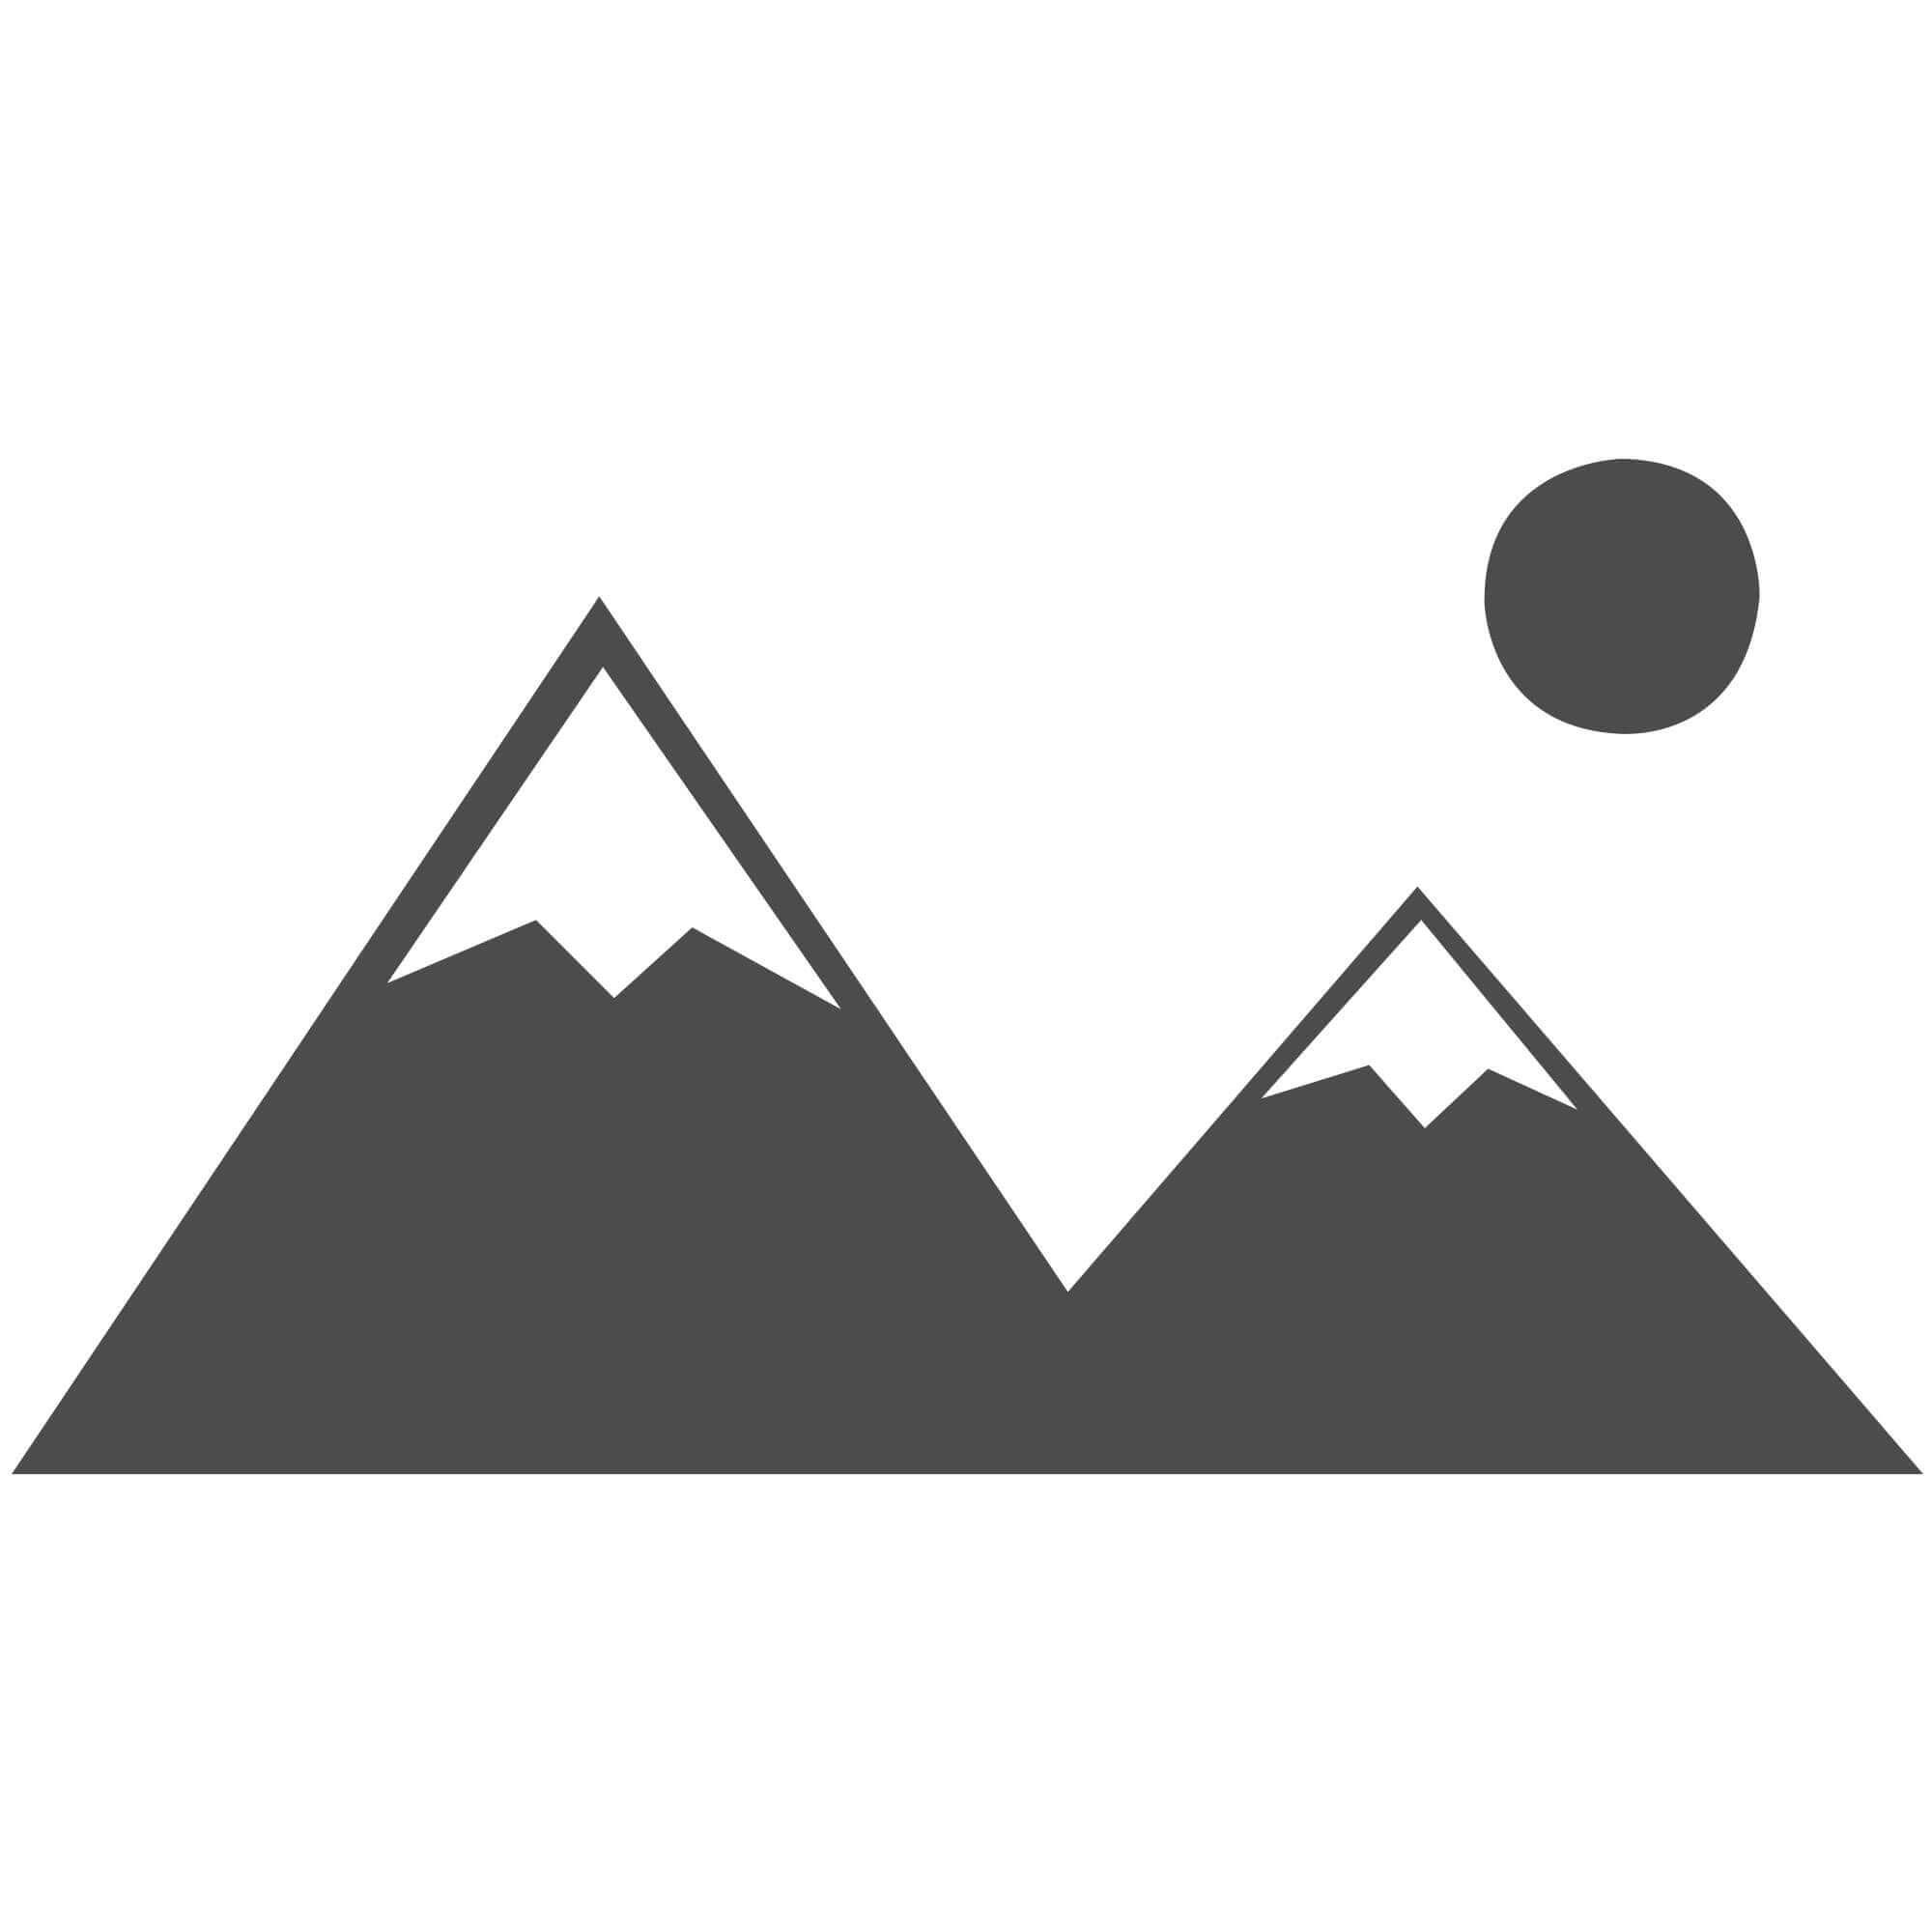 "Athena Shaggy Rug - Silver - Size 80 x 150 cm (2'8"" x 5')"